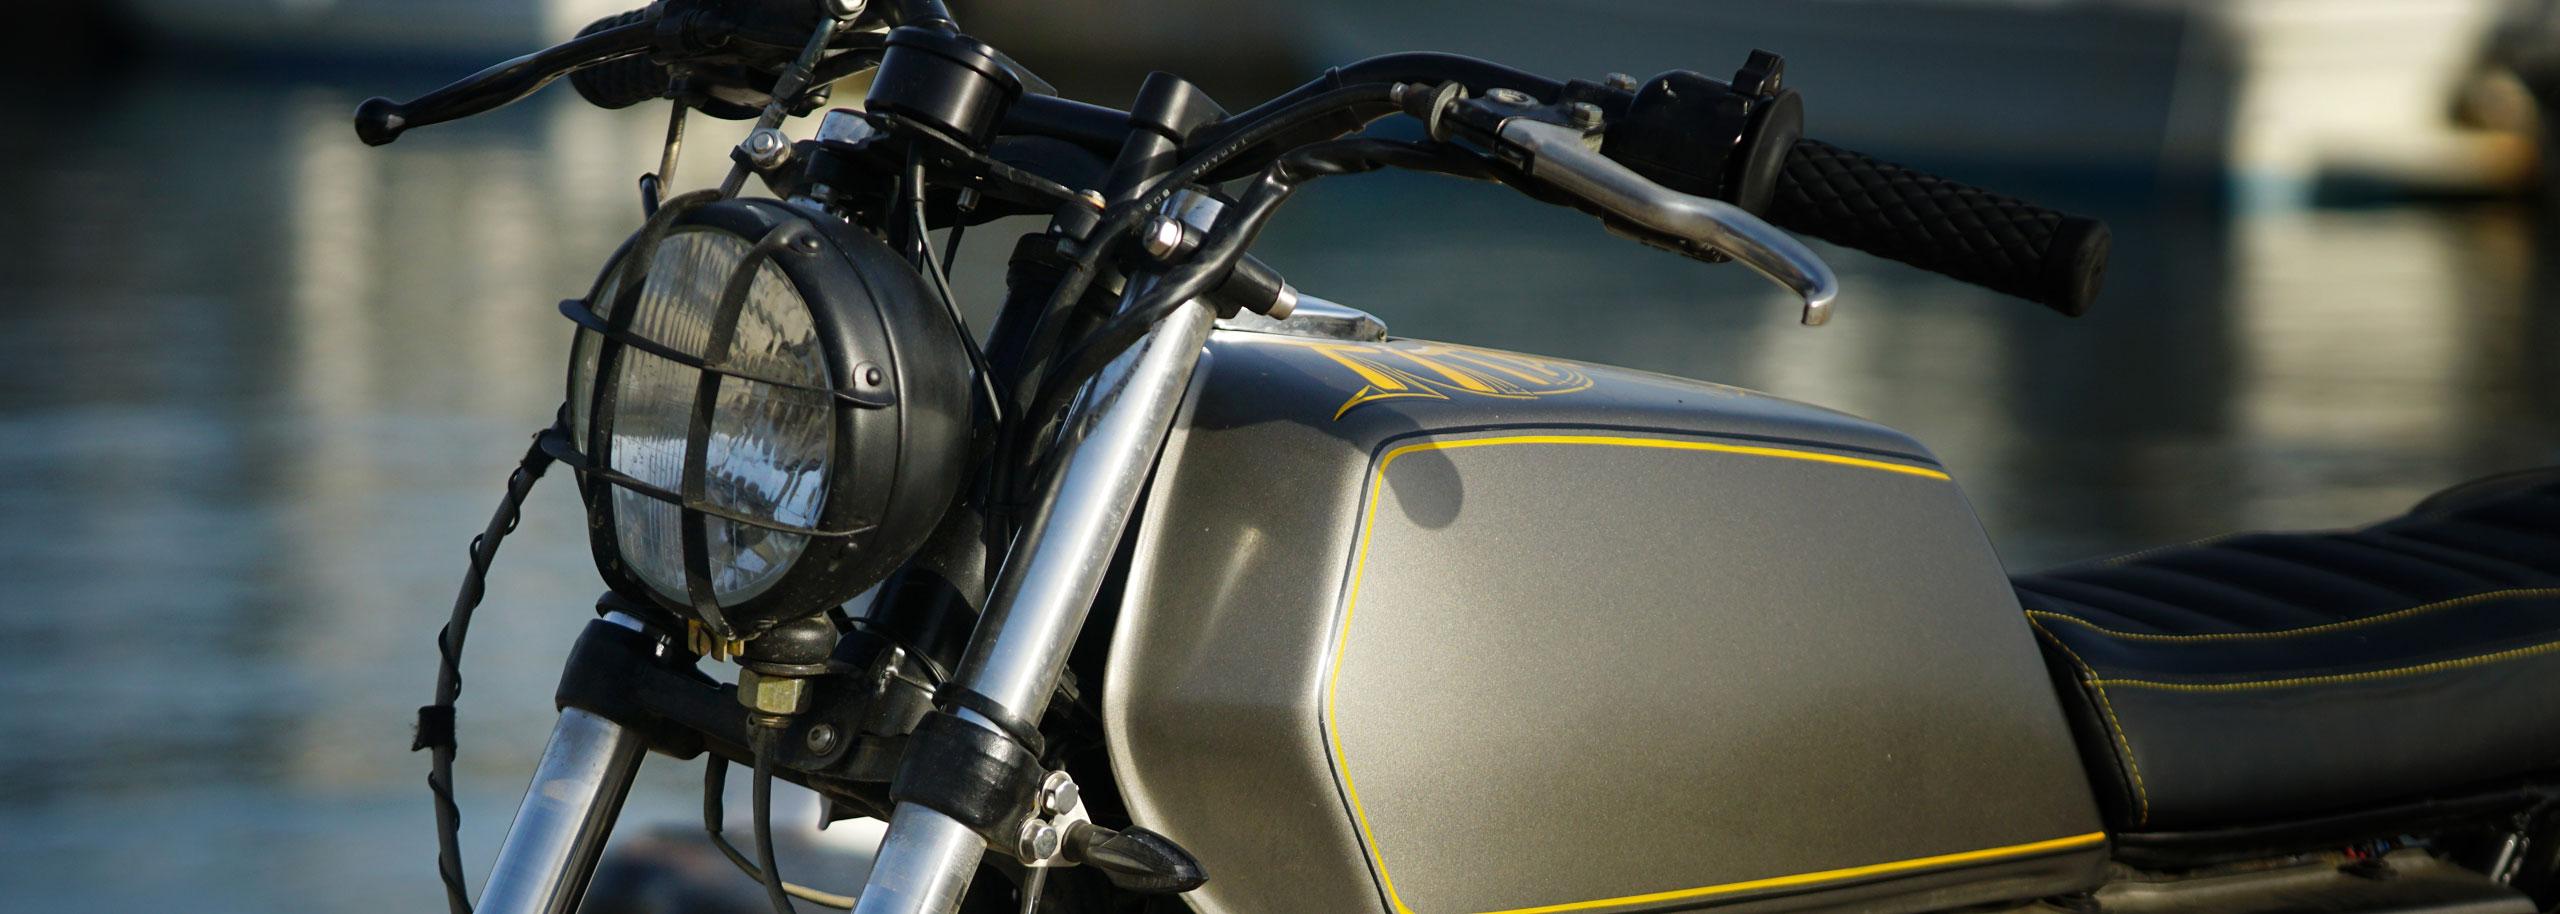 03_TITAN-Greek_Yamaha-Umbau-XS-500_Cafe-Racer-Graz-Motorrad-Umbau-Austria-Vintage_Custom-Bikes_Zweirad_Custom